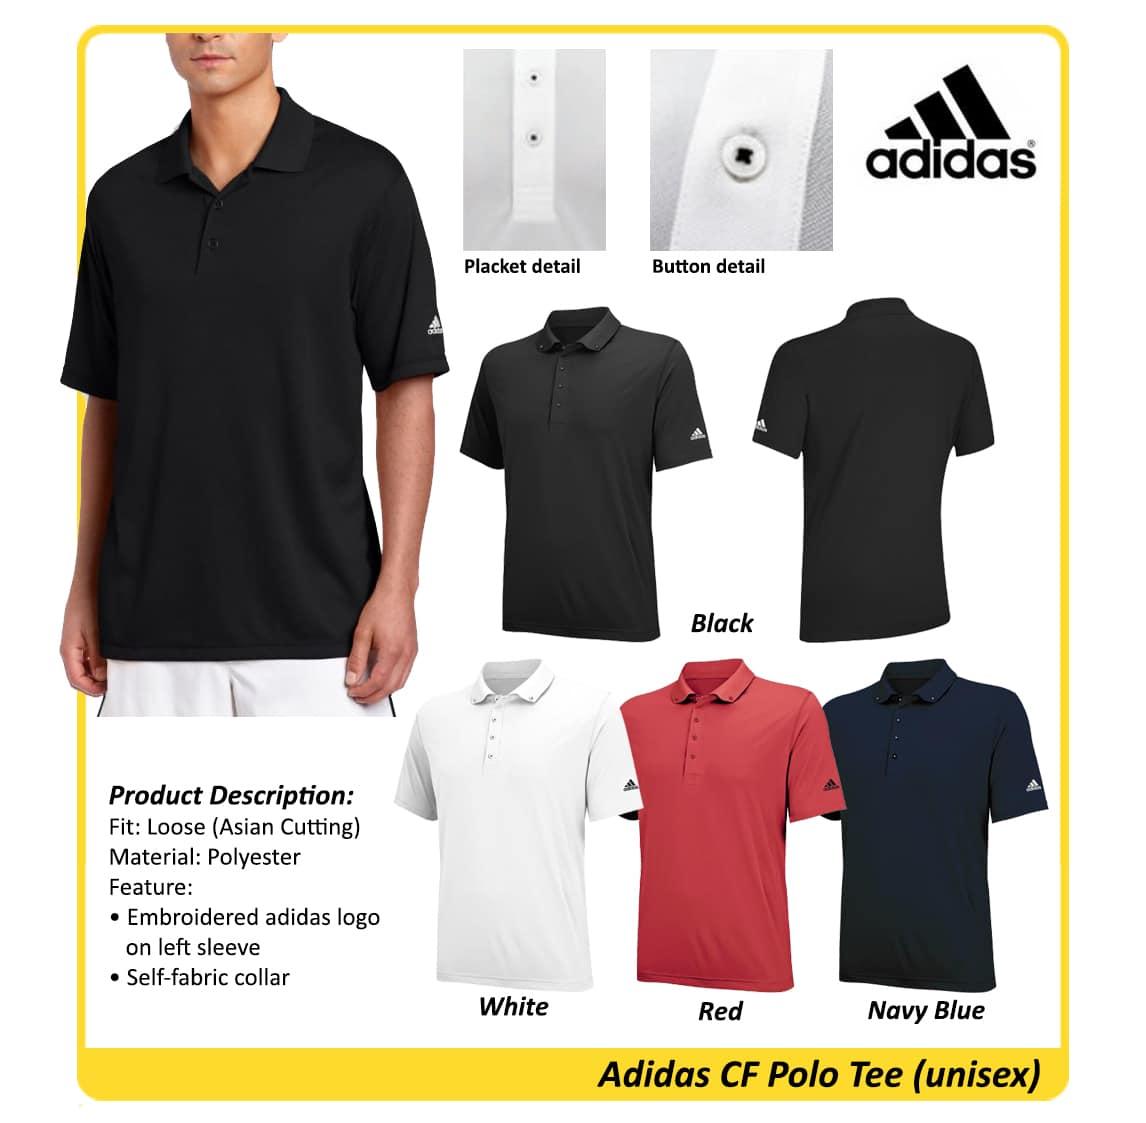 Adidas Golf Polo Tee